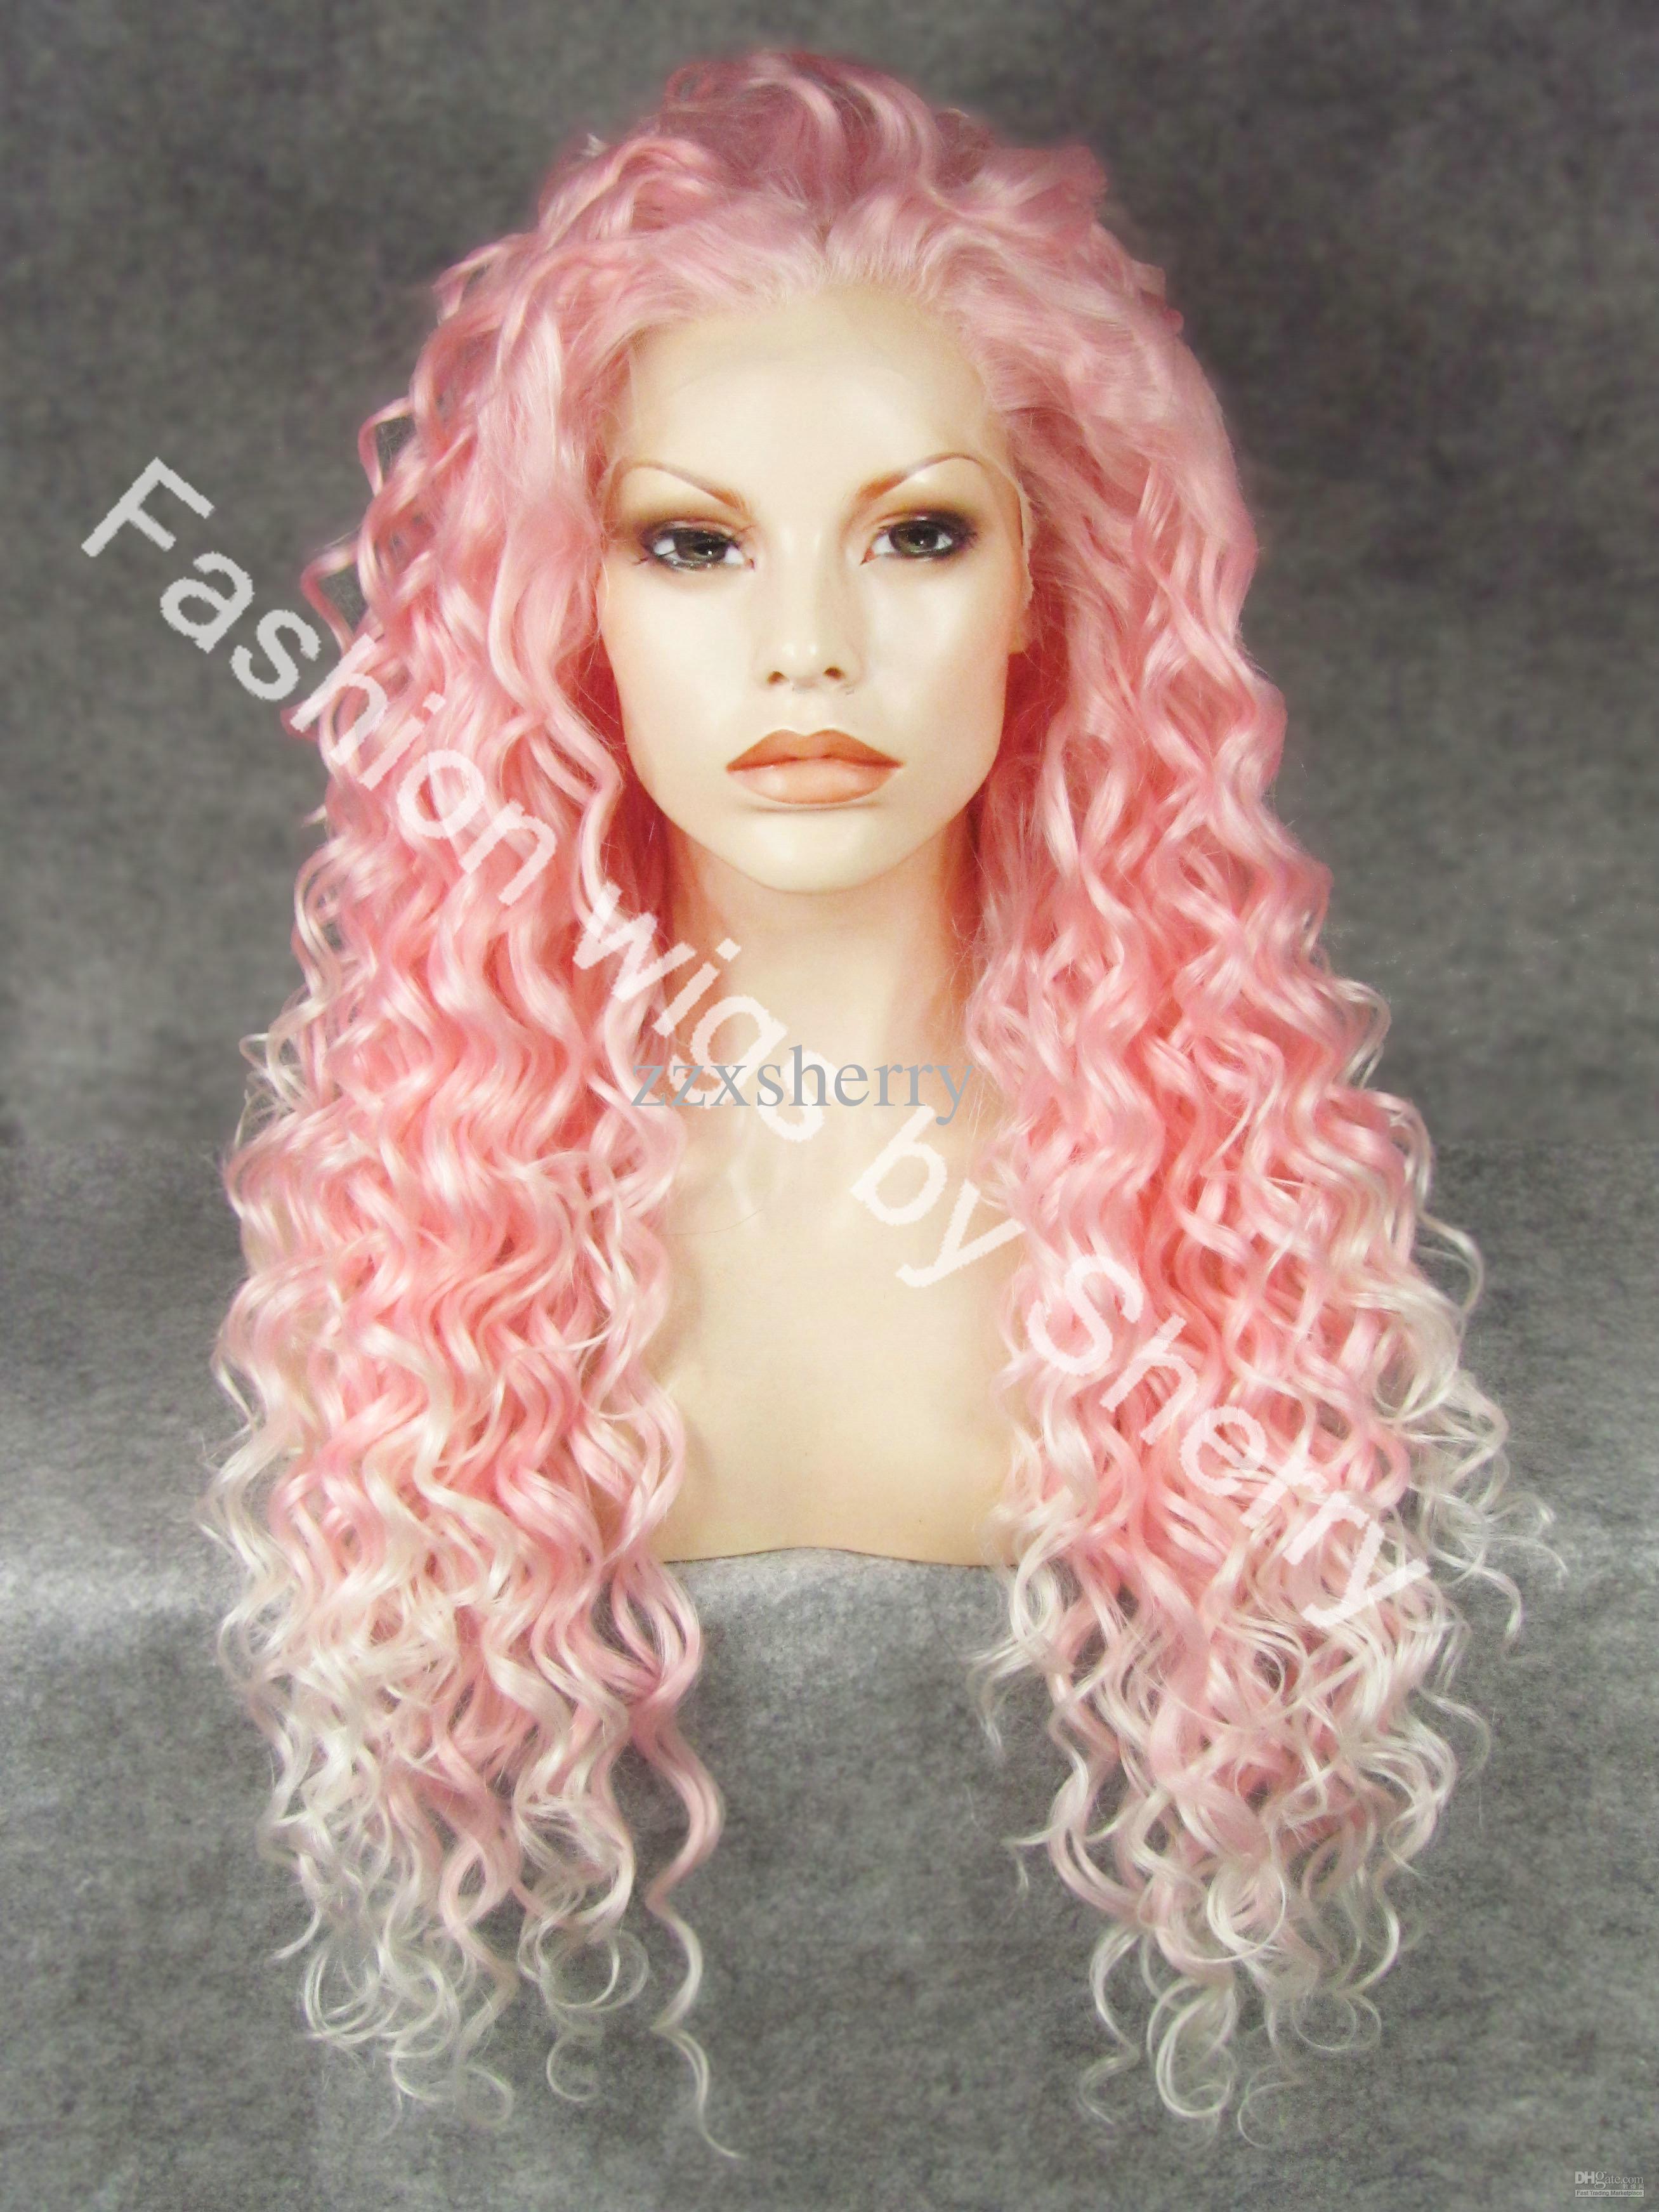 "26"" Extra Longo # 3100B / 1001 Rosa Tip-branco Curly amigável calor Synthetic Cabelo Partido da Frente Lace Wig"